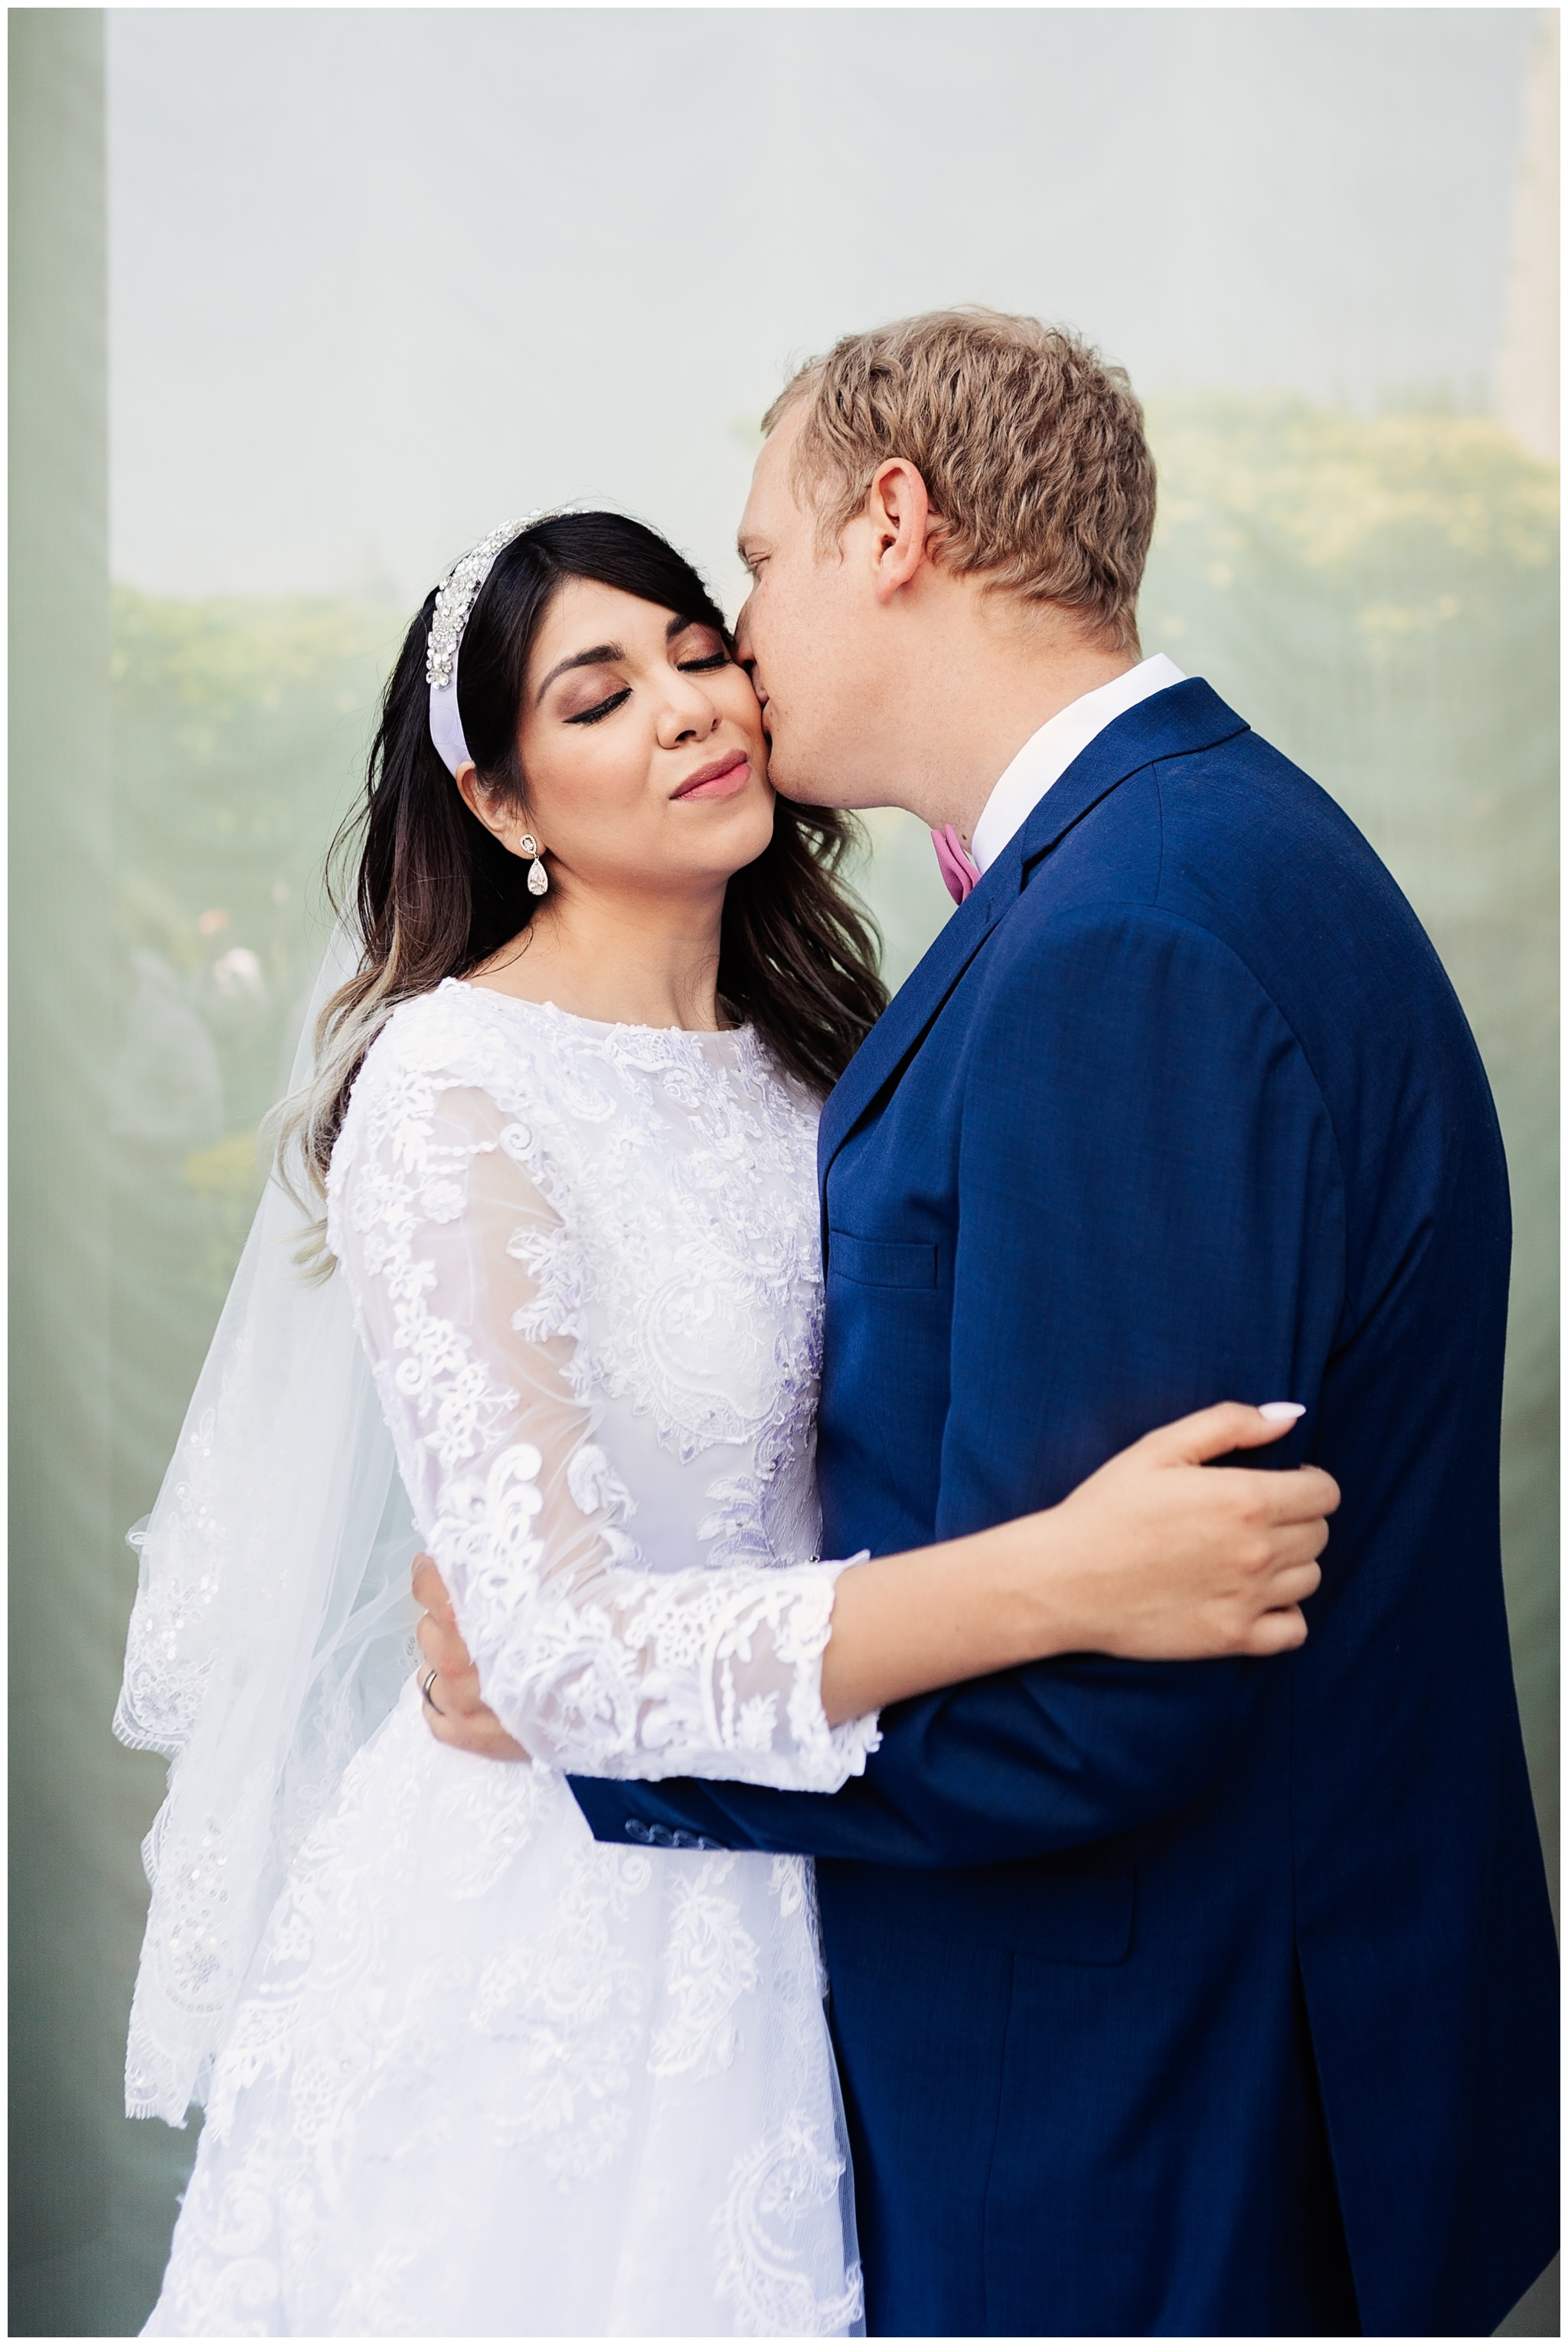 SLC Temple wedding Bride and Groom